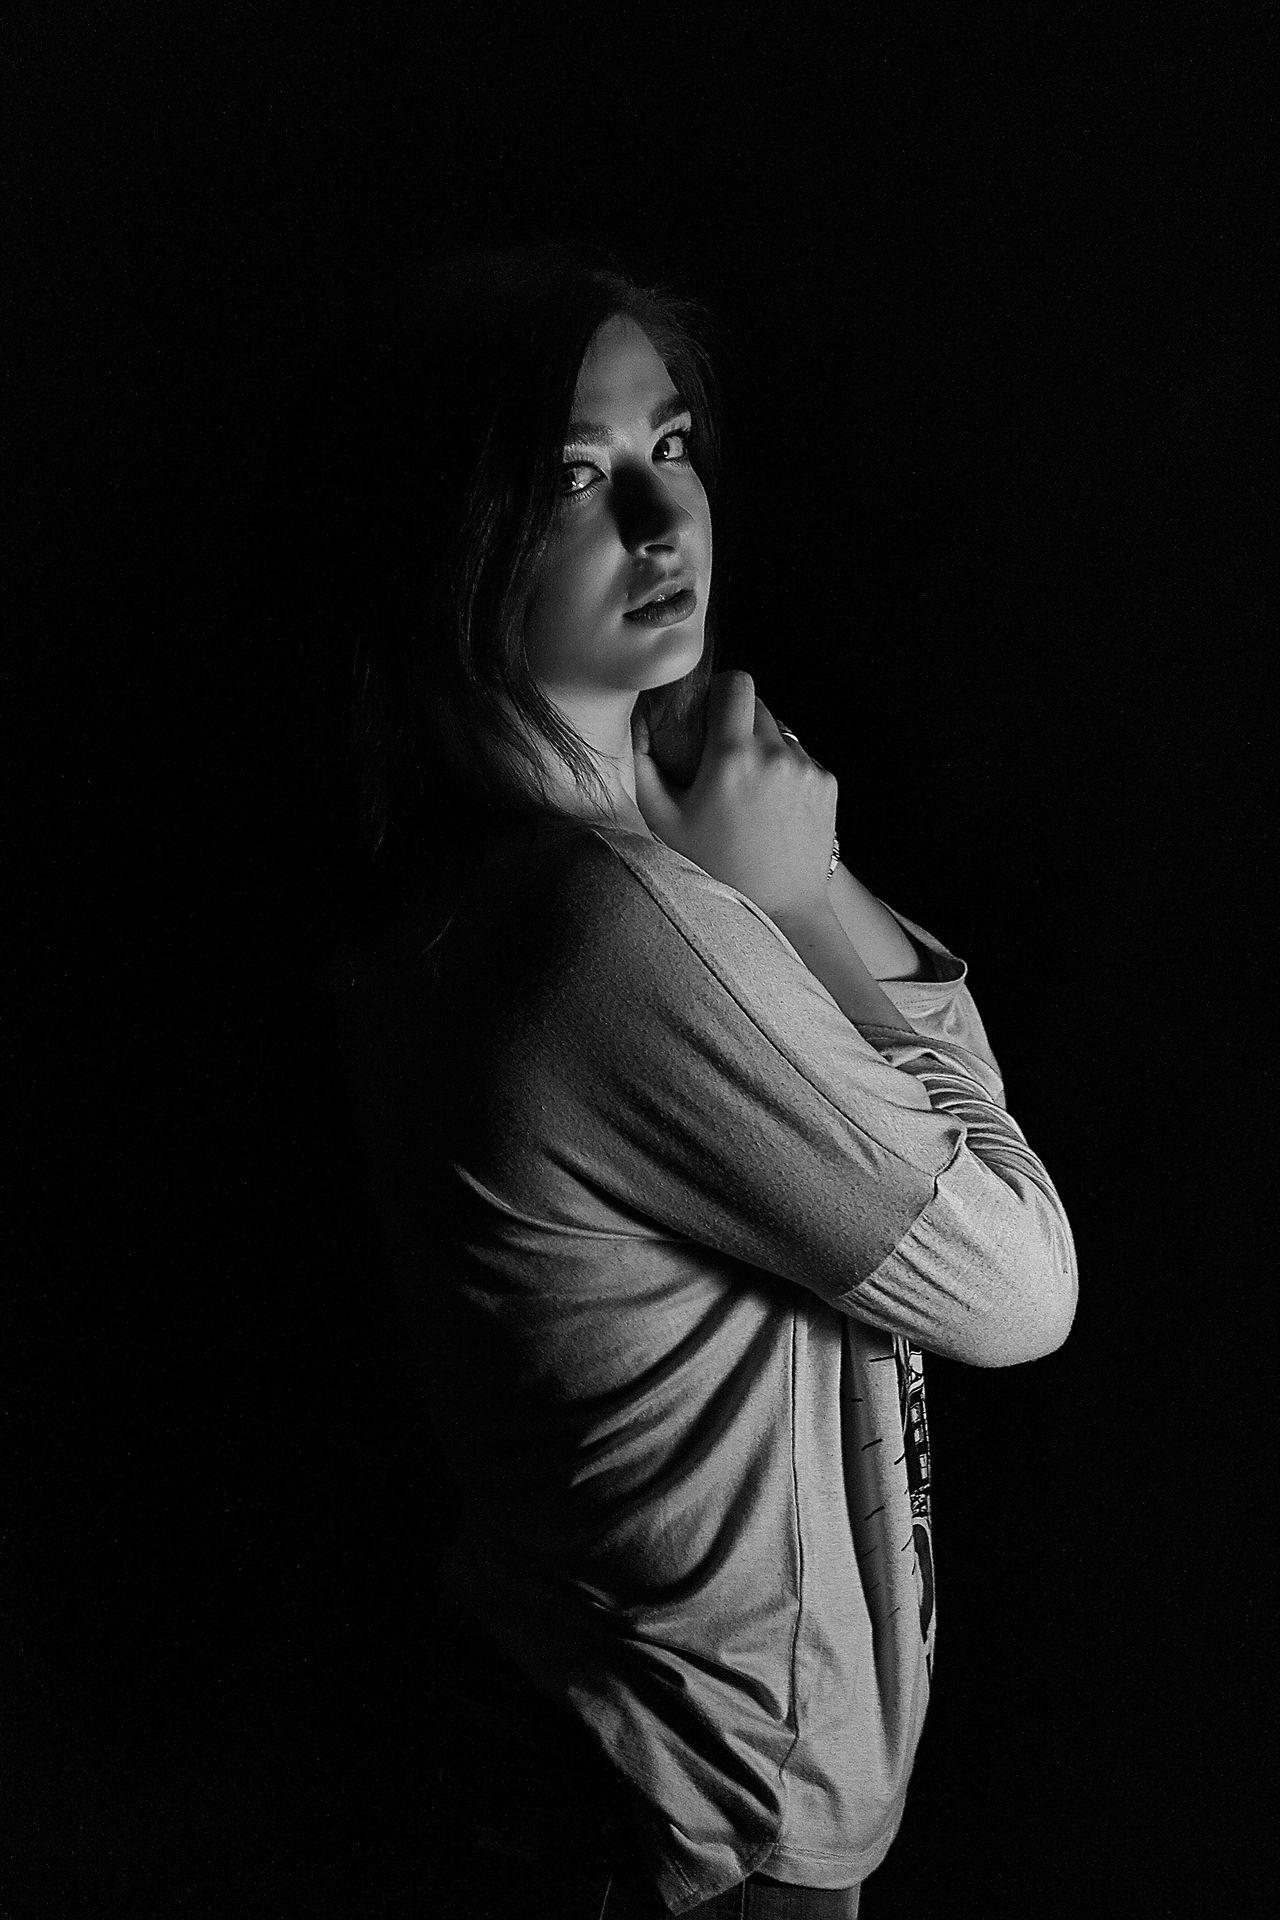 Russia Studio Shot Young Women Lifestyles One Person Black Background Black & White Blackandwhite Bw_ Collection Blackandwhite Photography EyeEm Best Shots - Black + White Black And White EyeEm Bnw Women